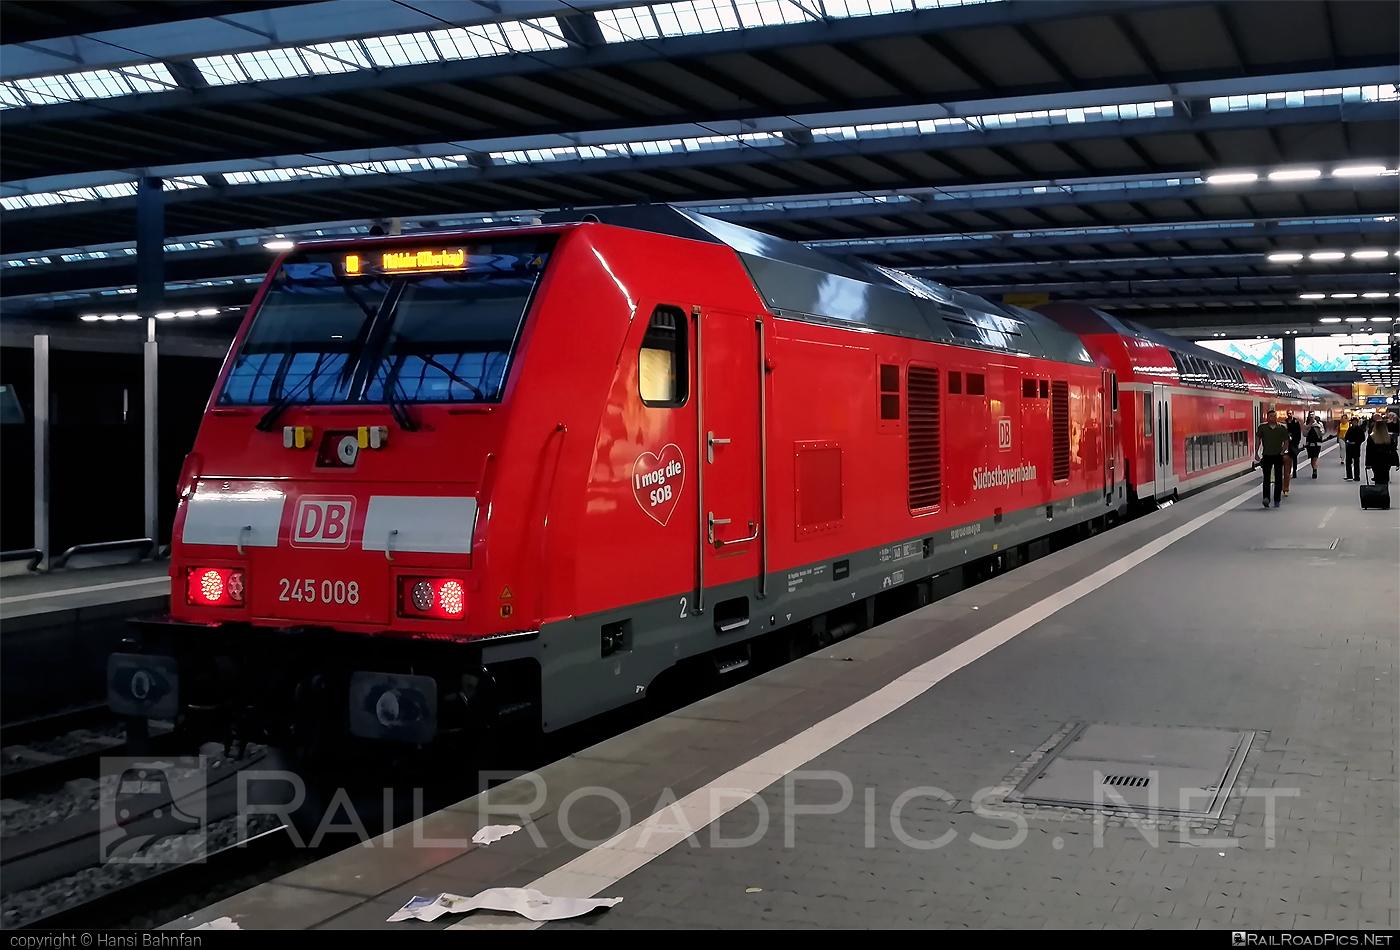 Bombardier TRAXX P160 DE - 245 008 operated by Deutsche Bahn / DB AG #bombardier #bombardiertraxx #db #dbregio #deutschebahn #sudostbayernbahn #traxx #traxxp160 #traxxp160de